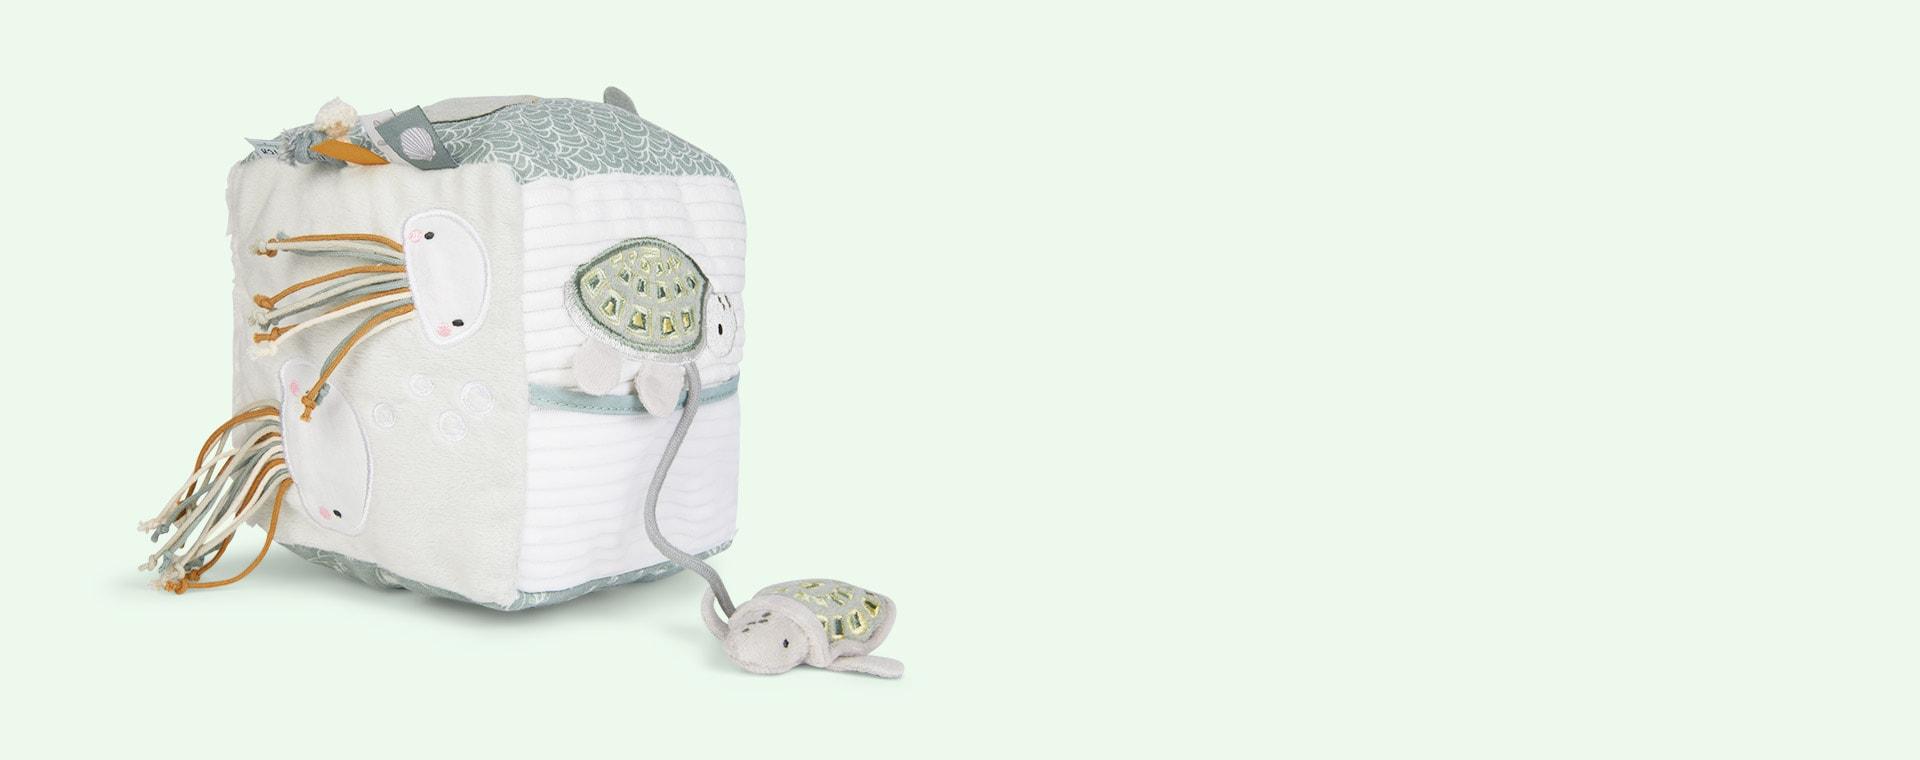 Ocean Mint Little Dutch Soft Activity Cube